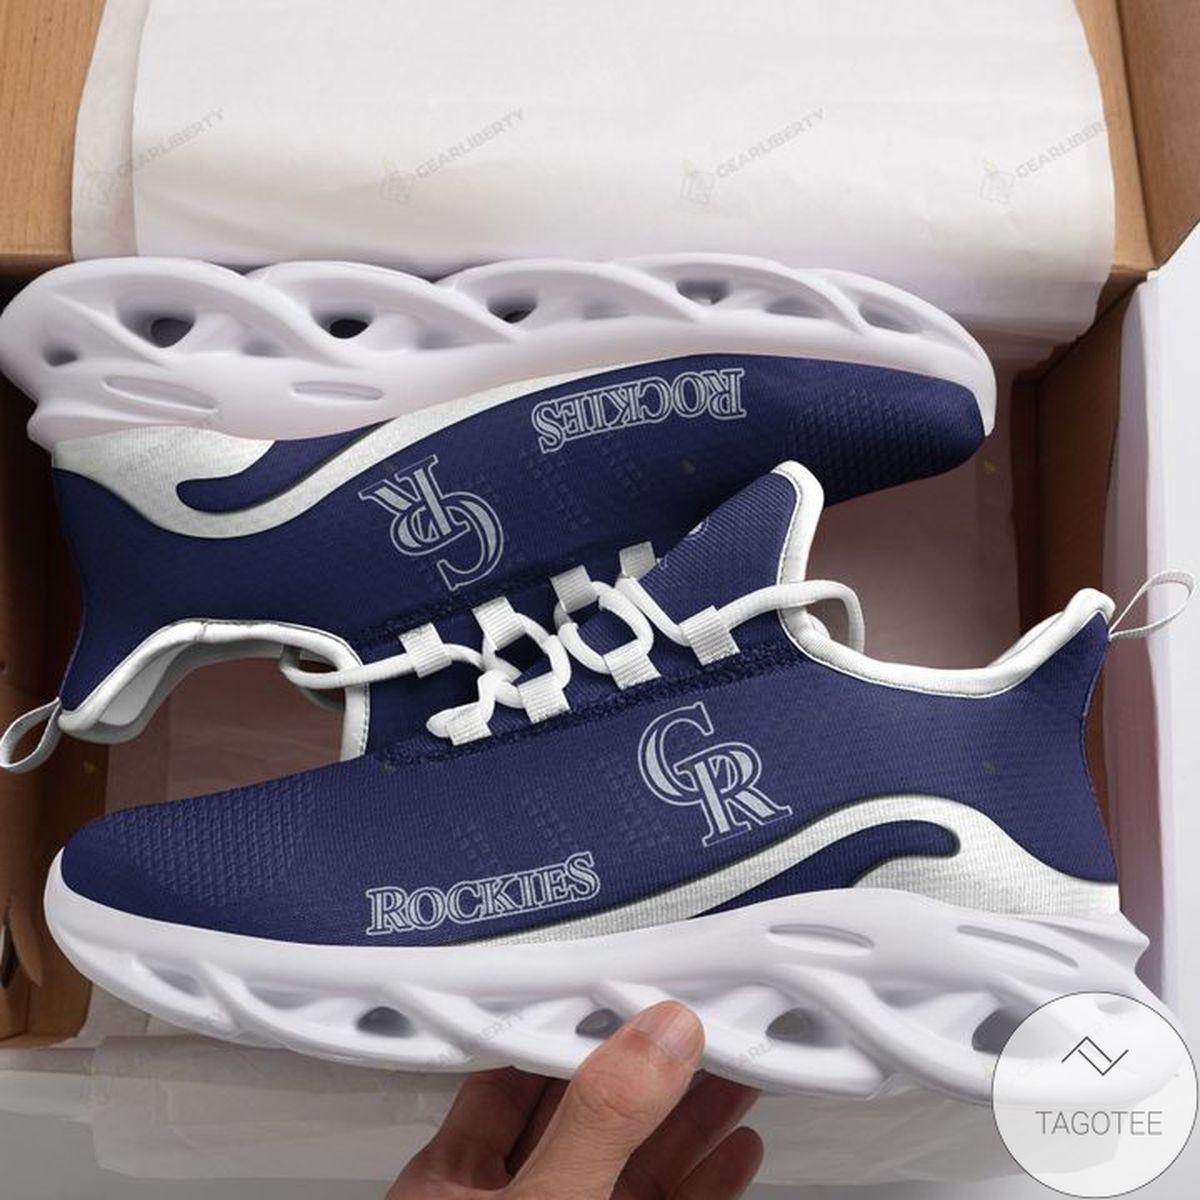 MLB Colorado Rockies Max Soul Shoes